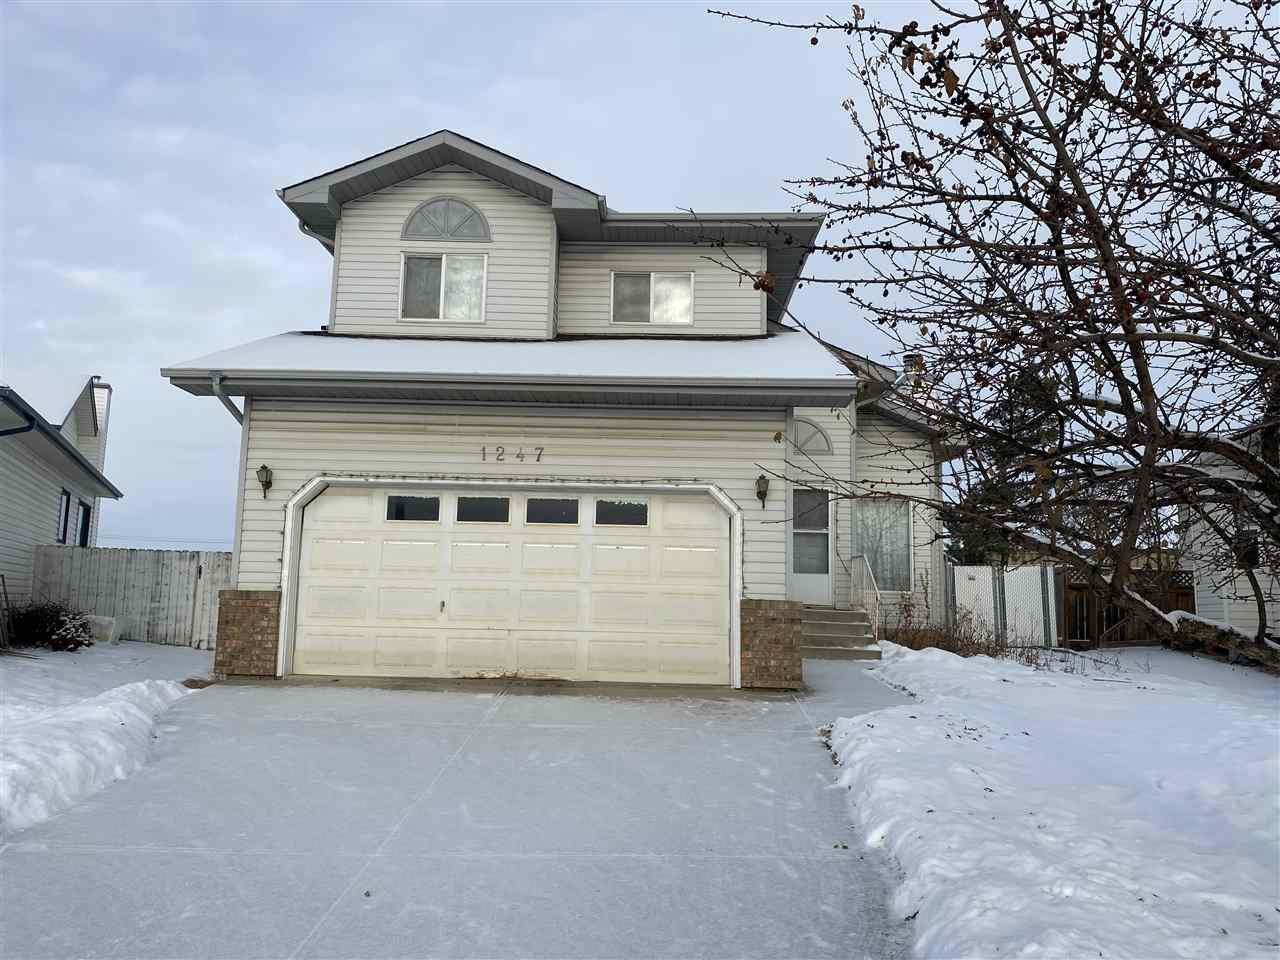 Main Photo: 1247 JOYCE Crescent in Edmonton: Zone 29 House for sale : MLS®# E4223154